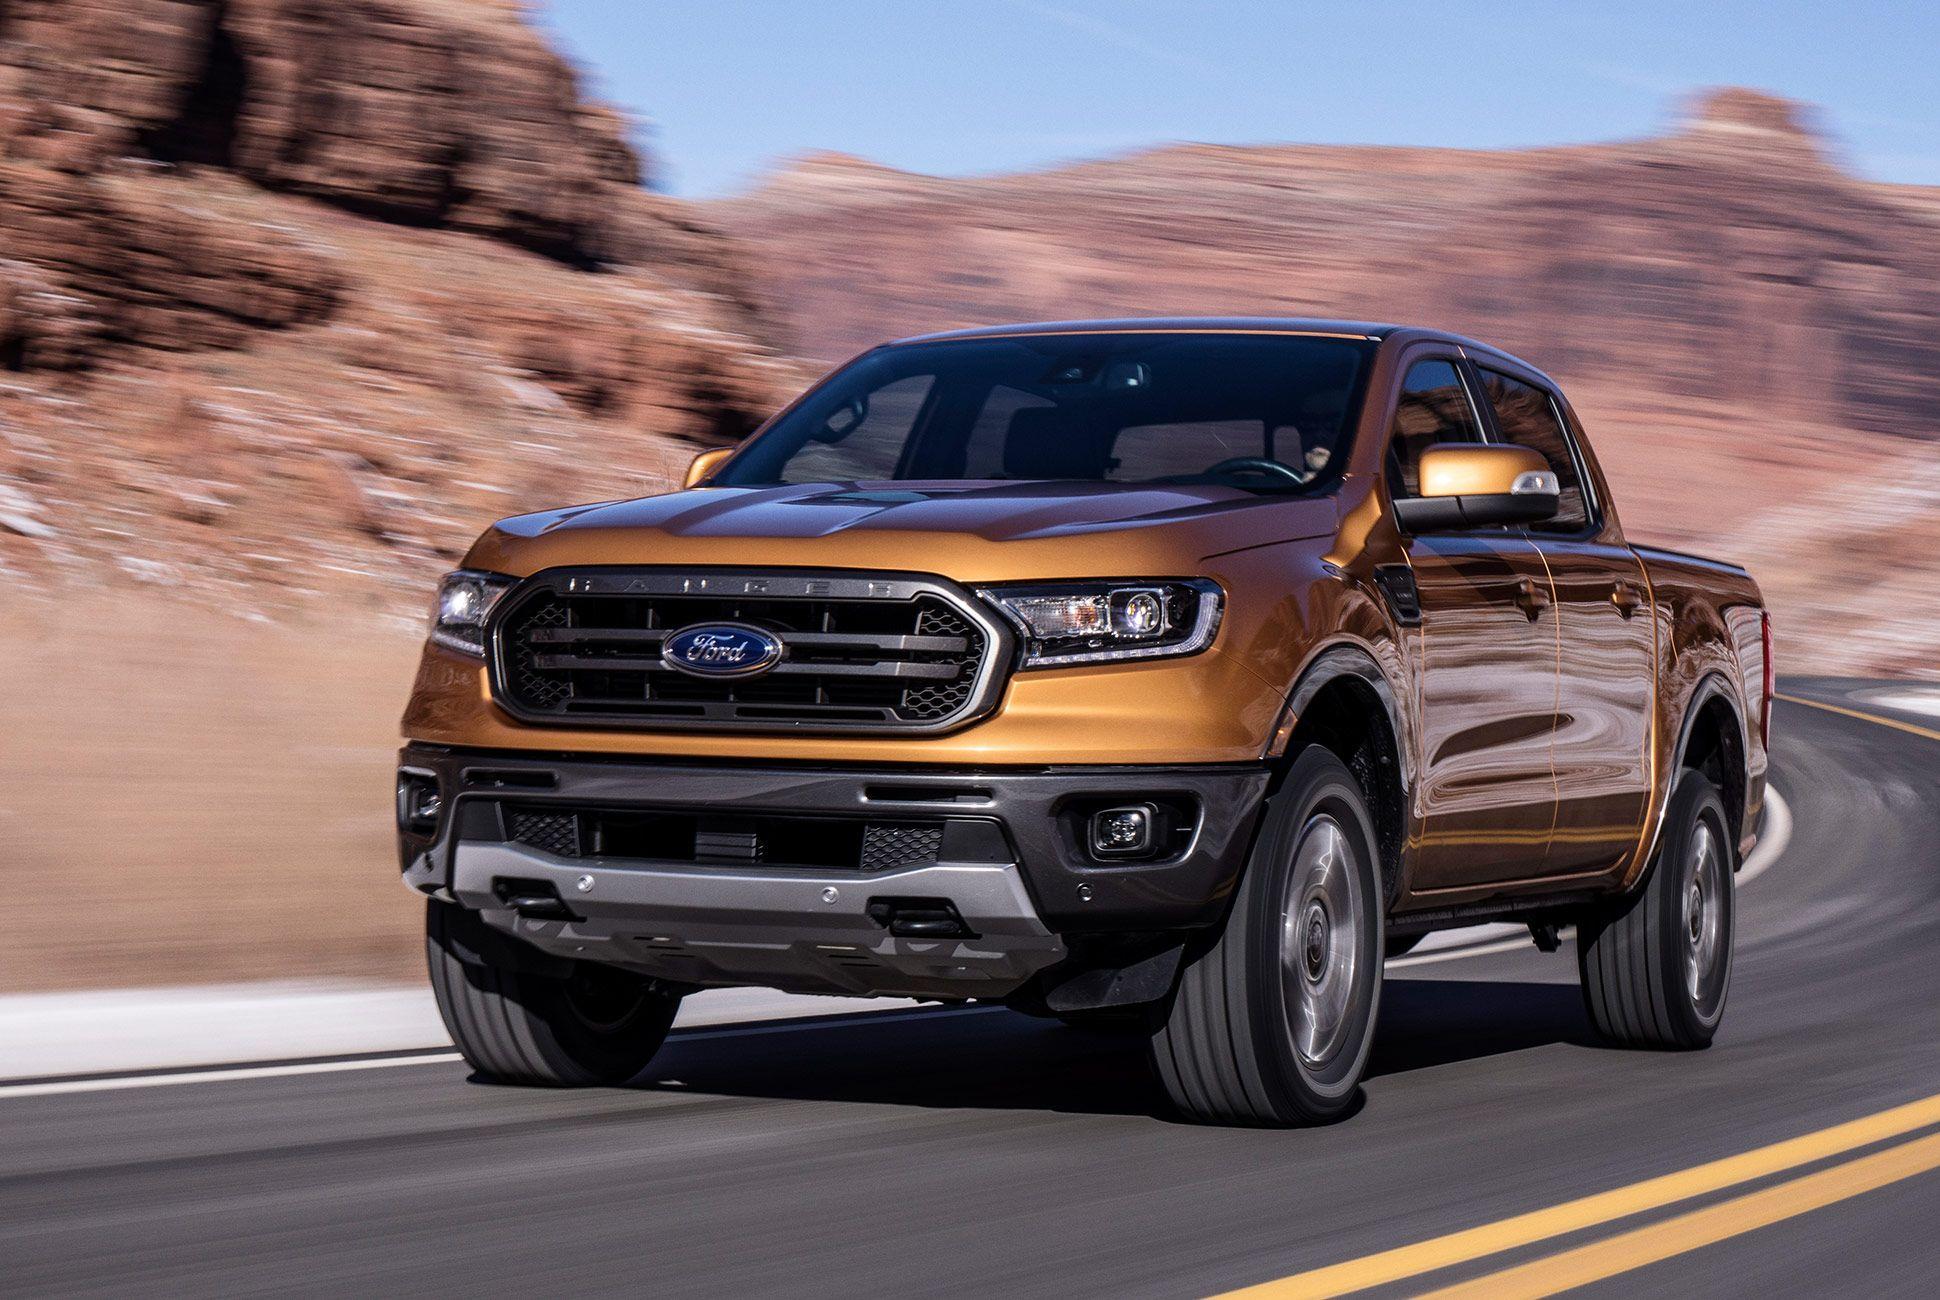 Ford-Ranger-gear-patrol-8